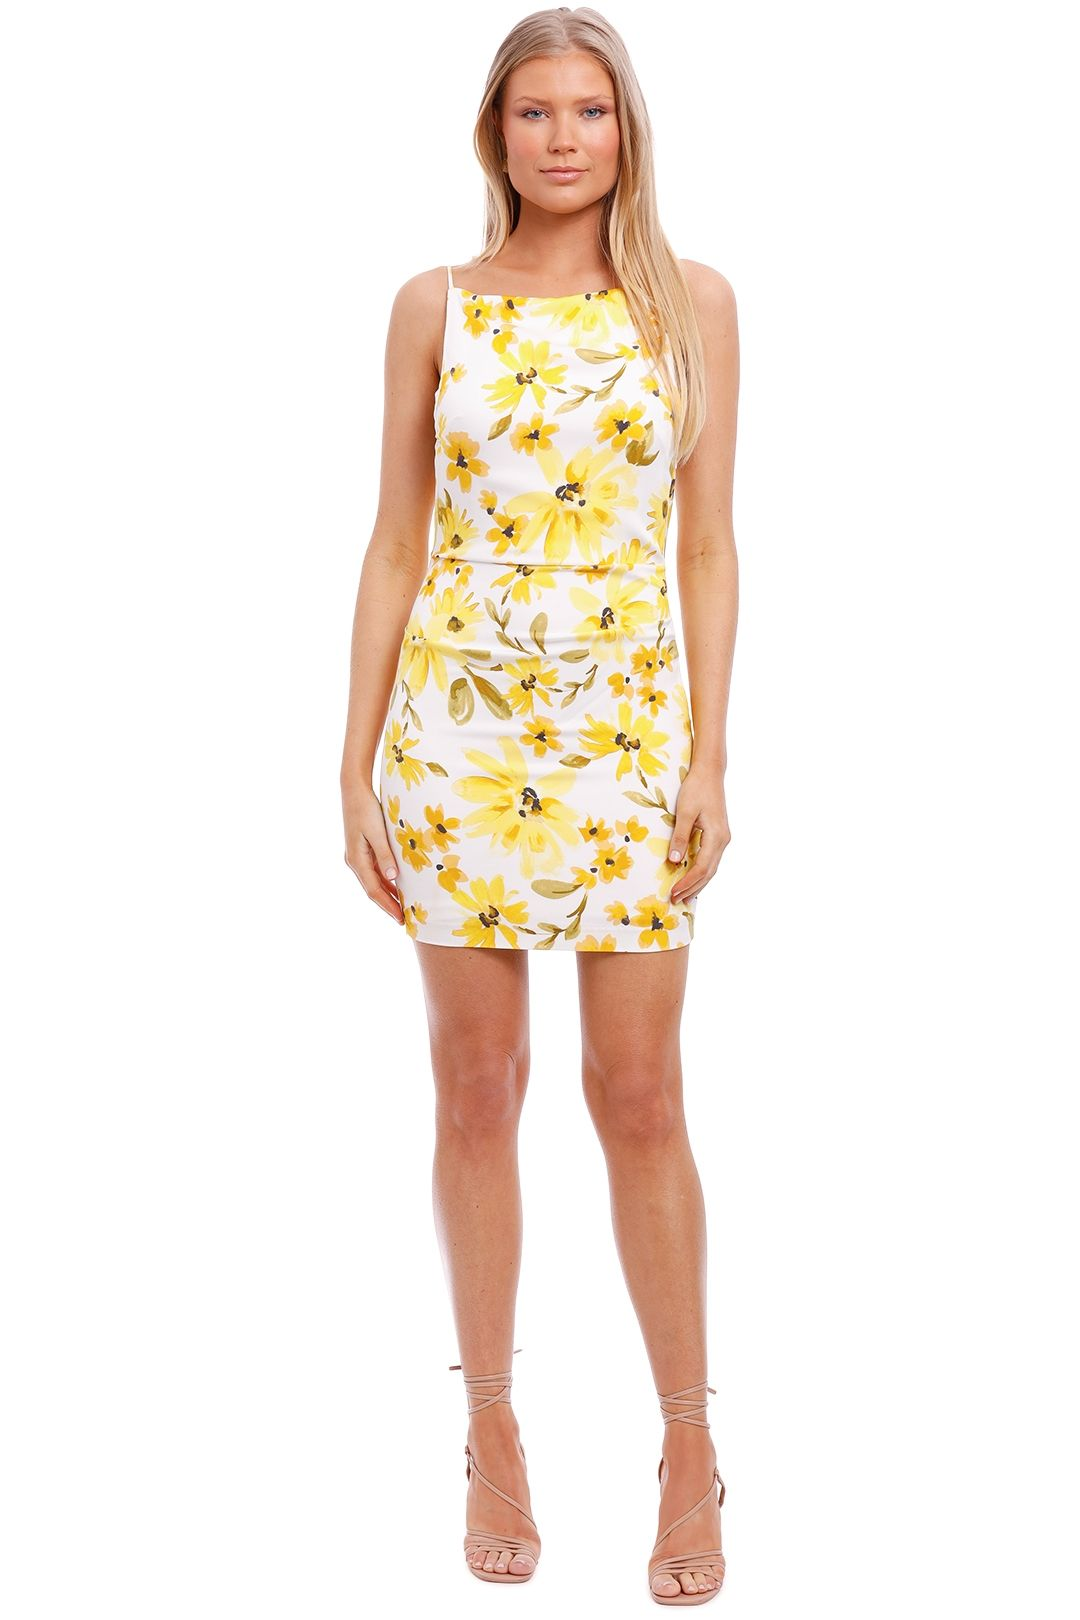 Bec and Bridge Daphne Mini Dress Print